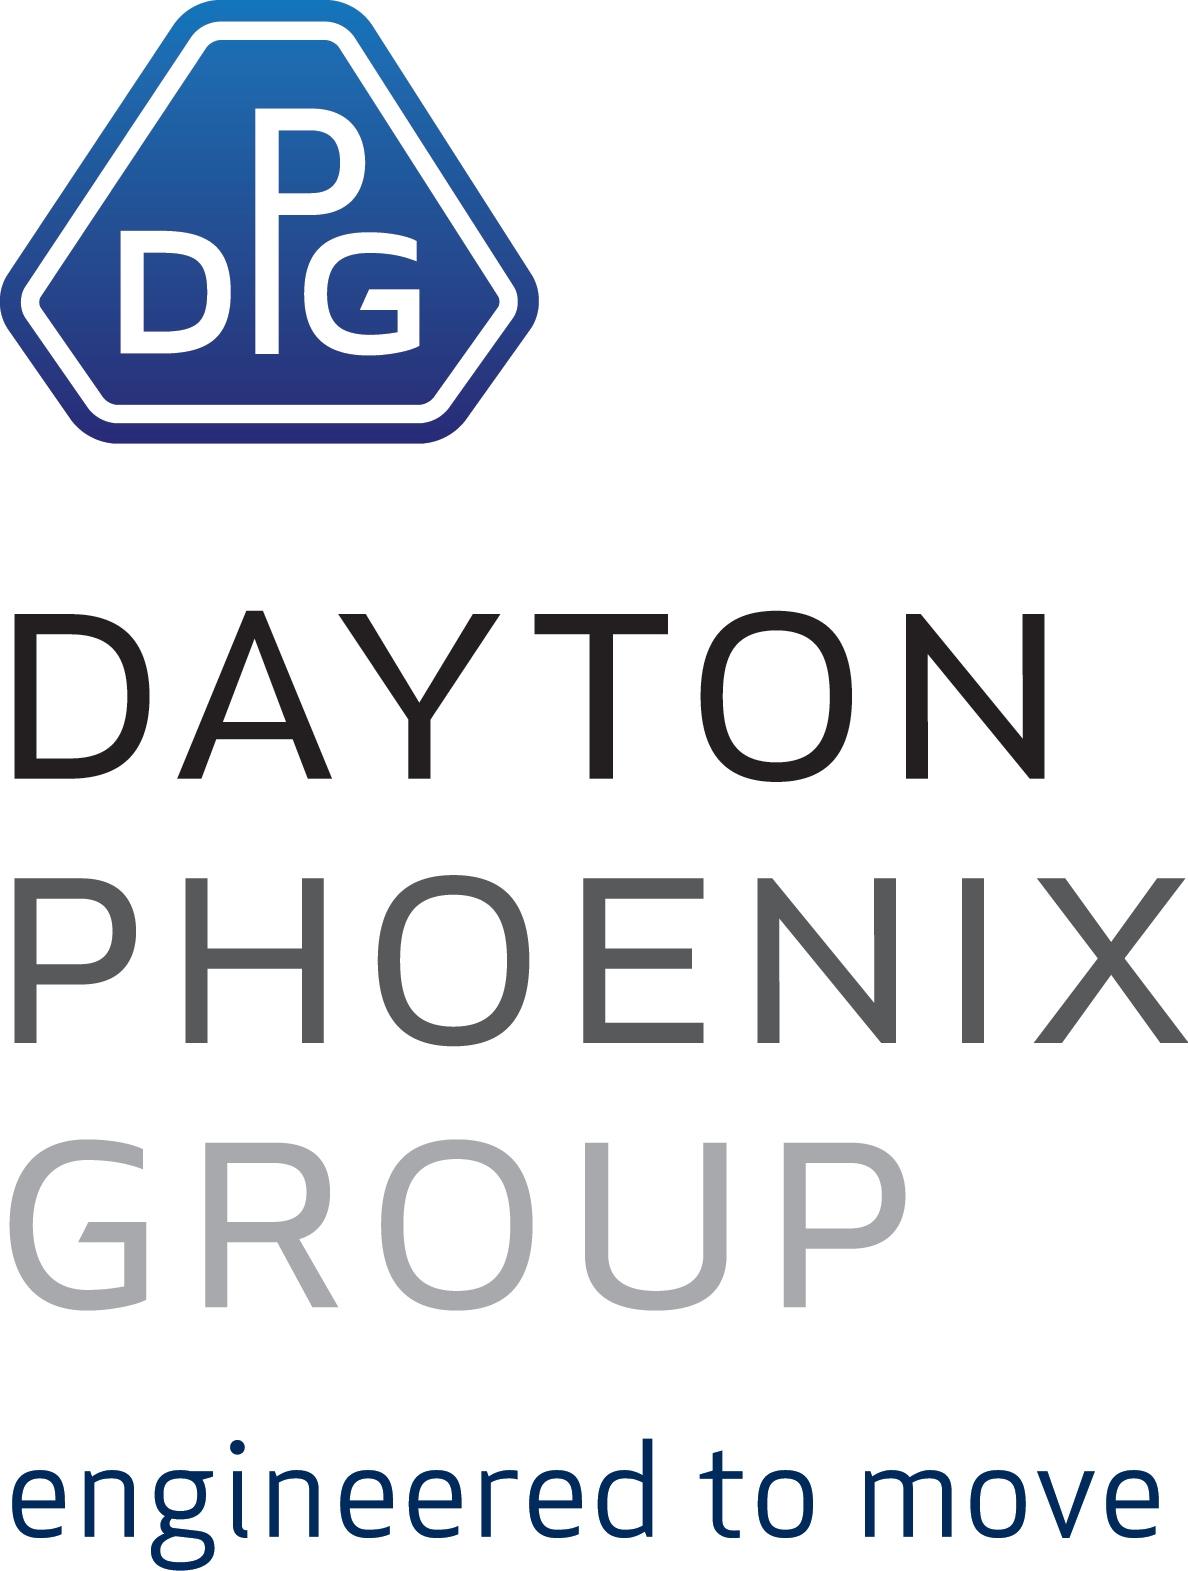 Dayton-Phoenix Group